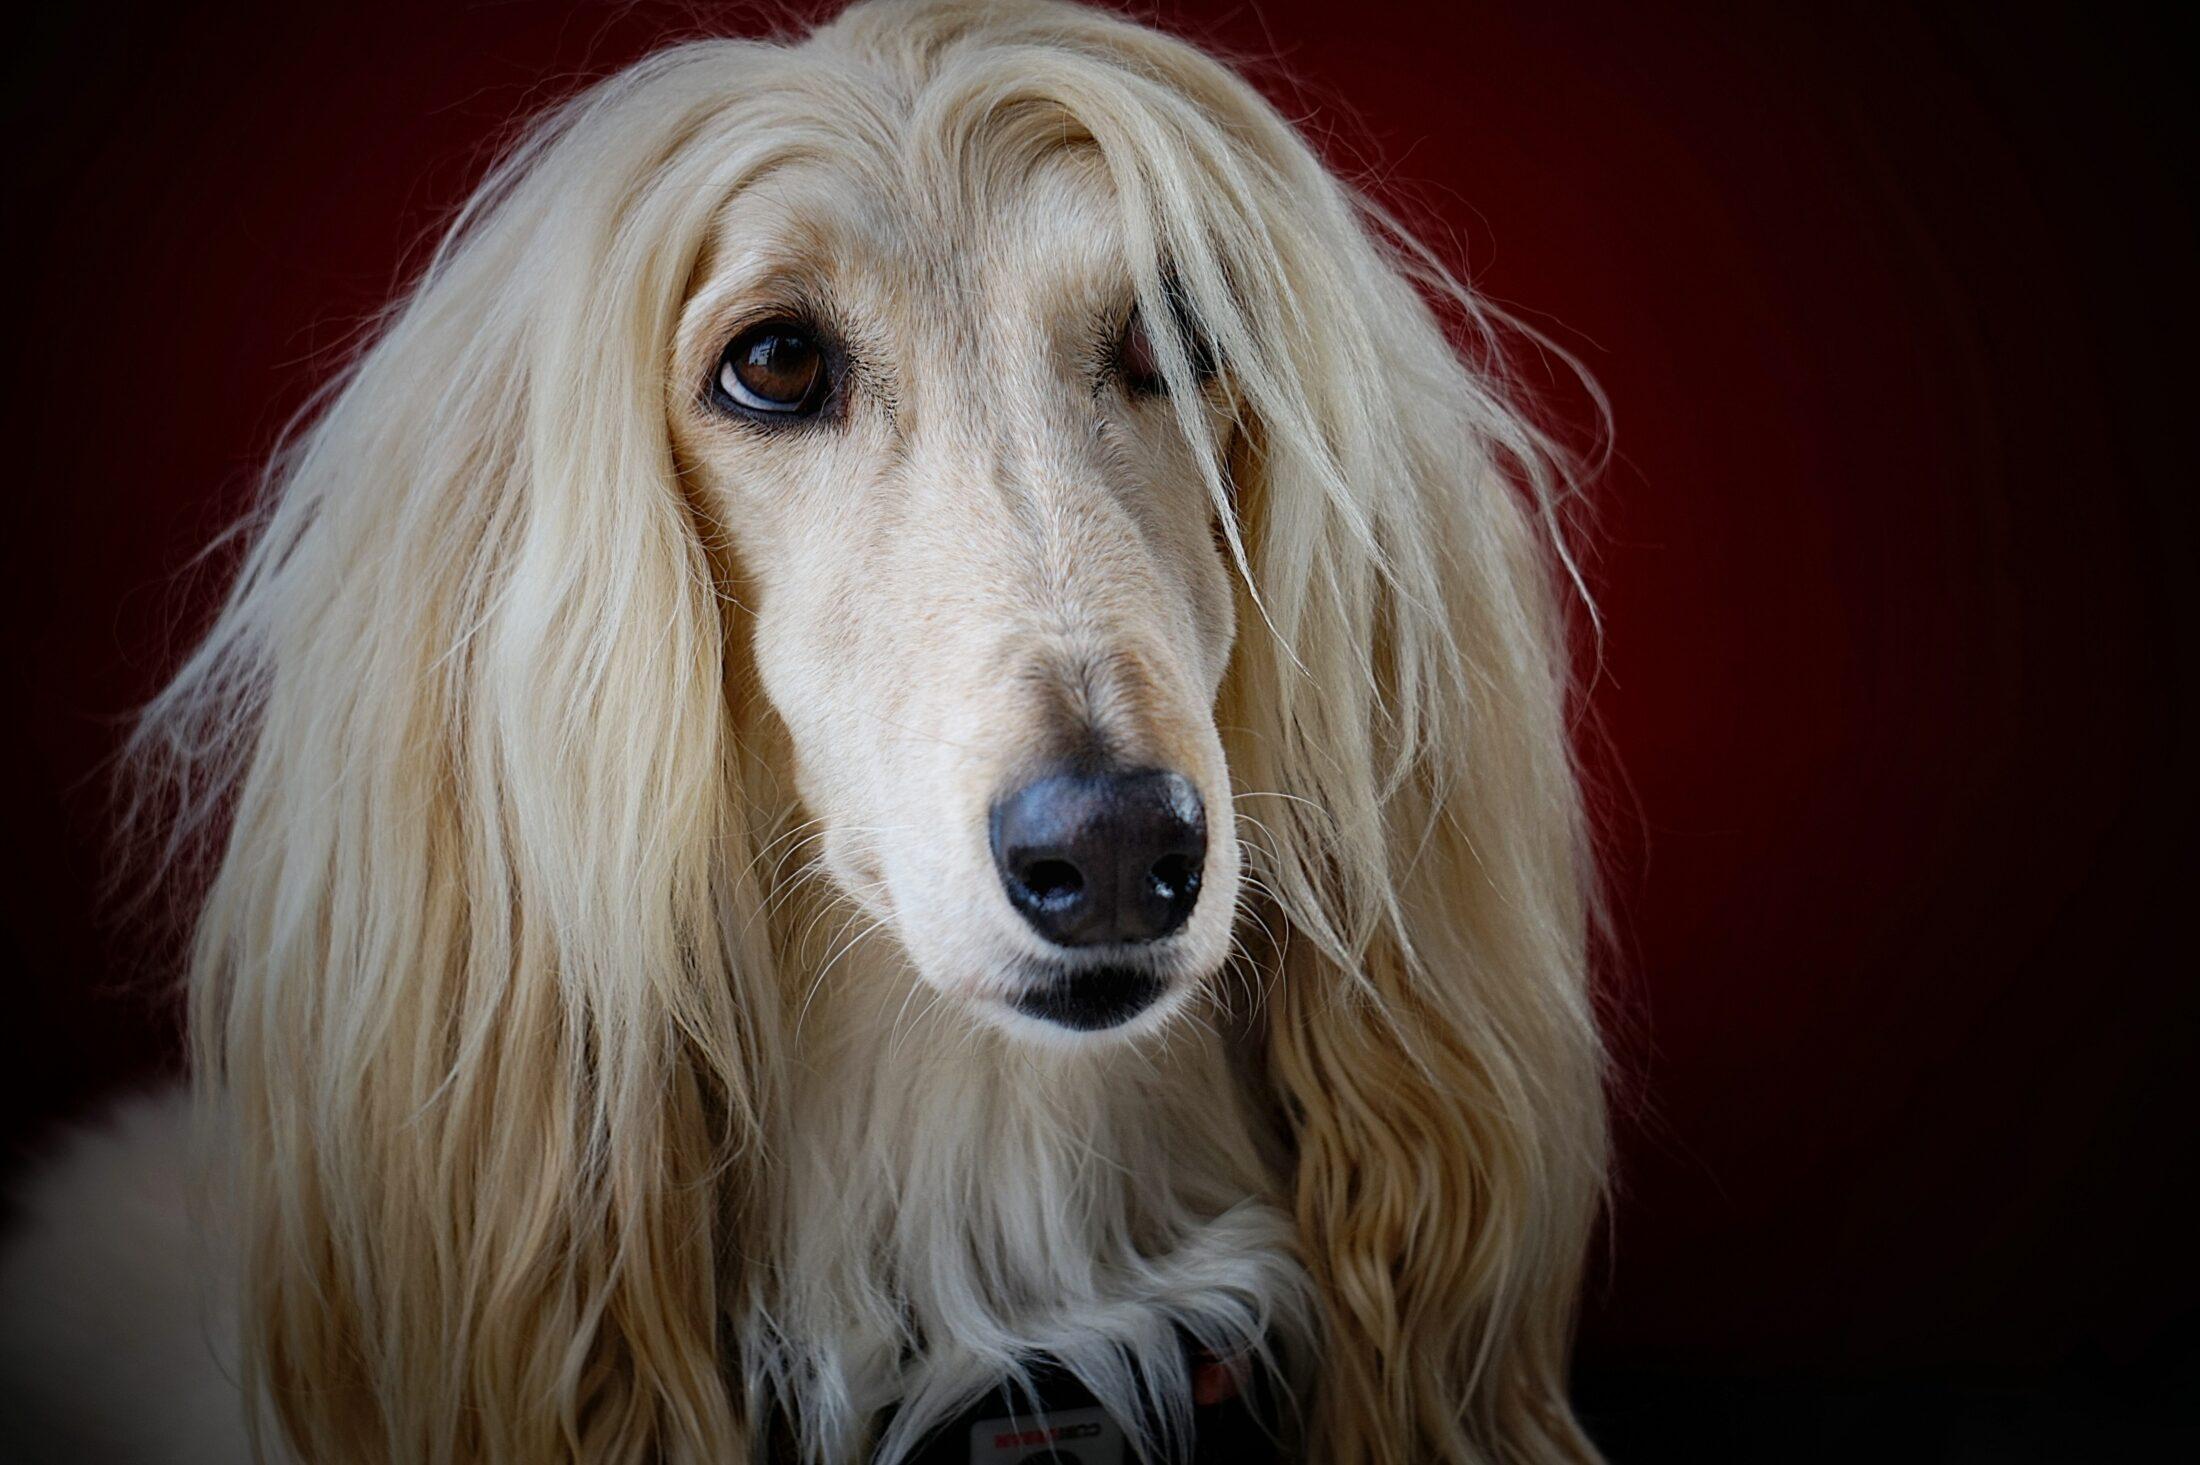 cachorro branco - afgan hound